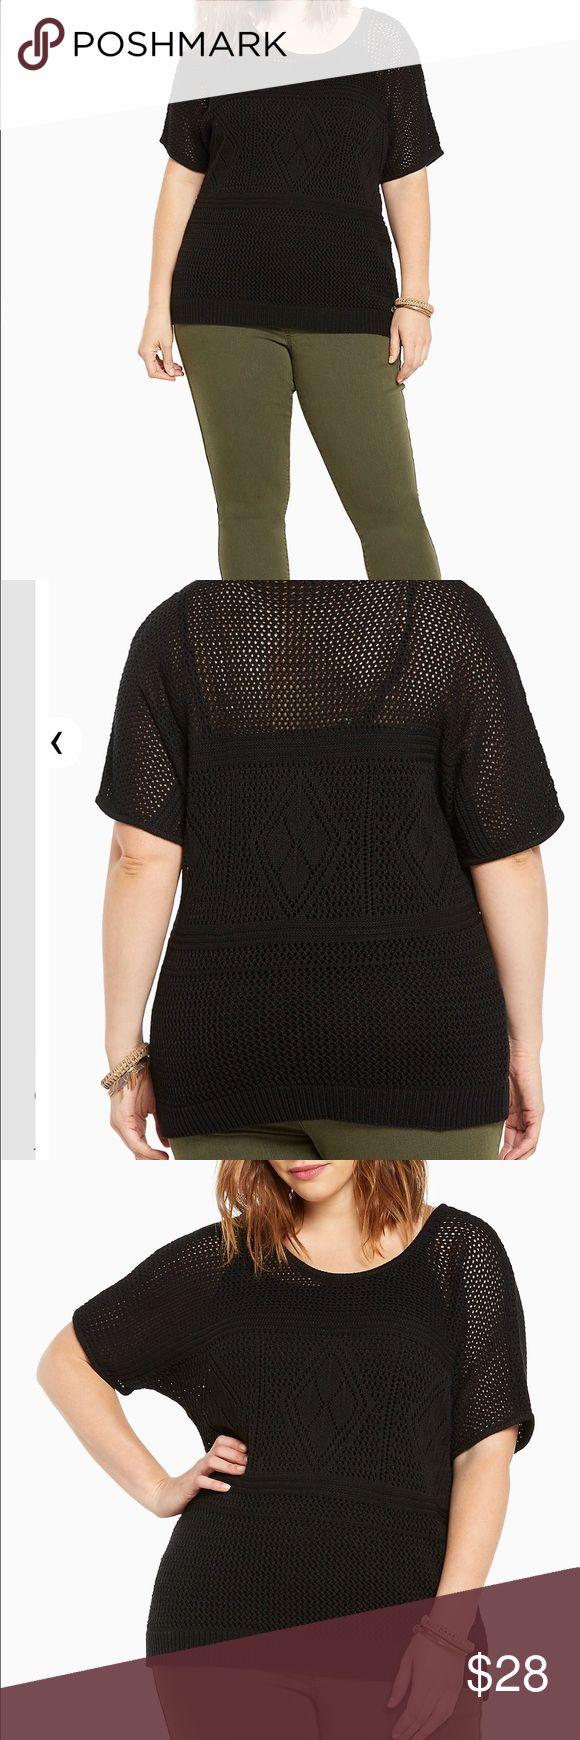 The 25+ best Black crochet shorts ideas on Pinterest | Crochet ...